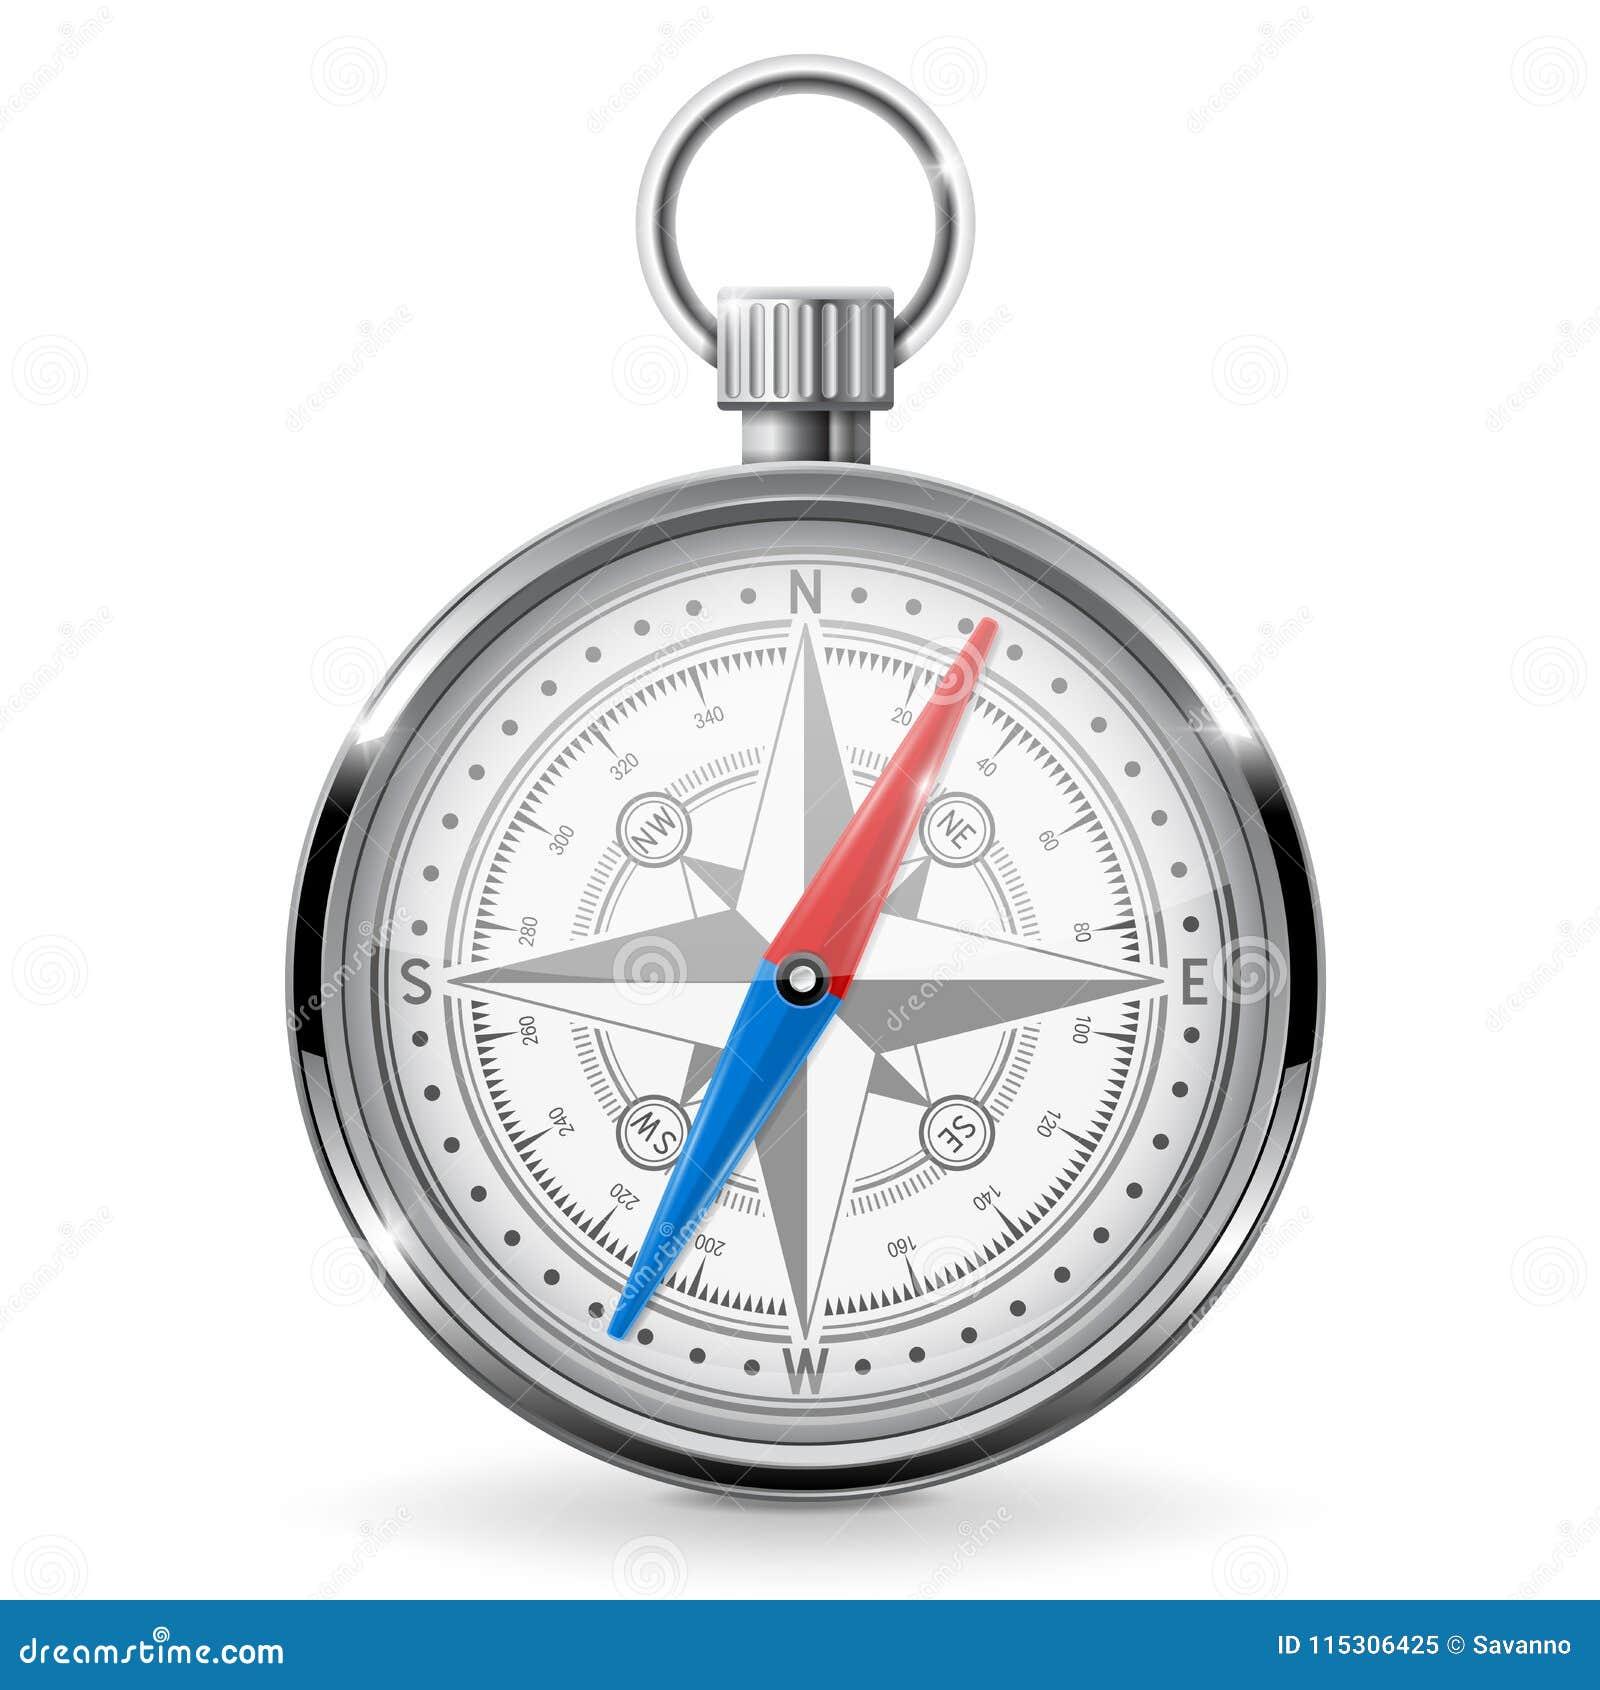 Metal compass. Navigation gauge